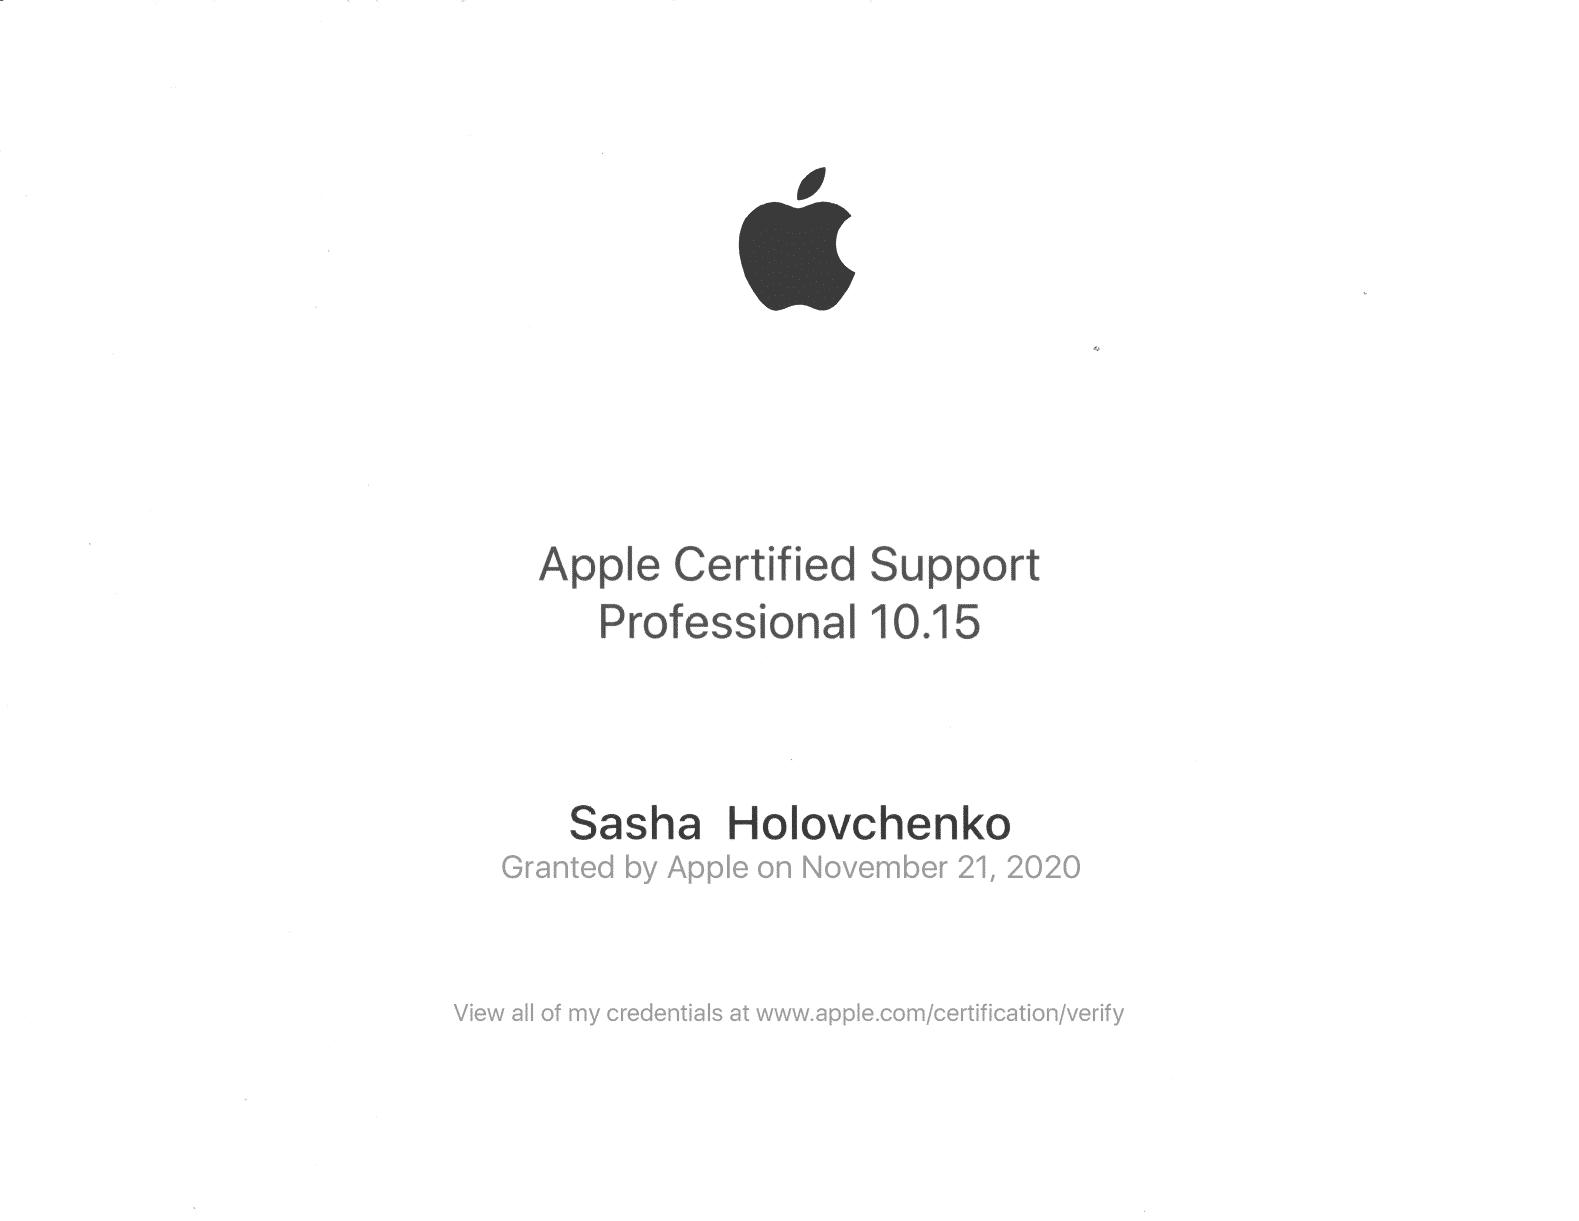 Apple certificate Sasha Holovchenko